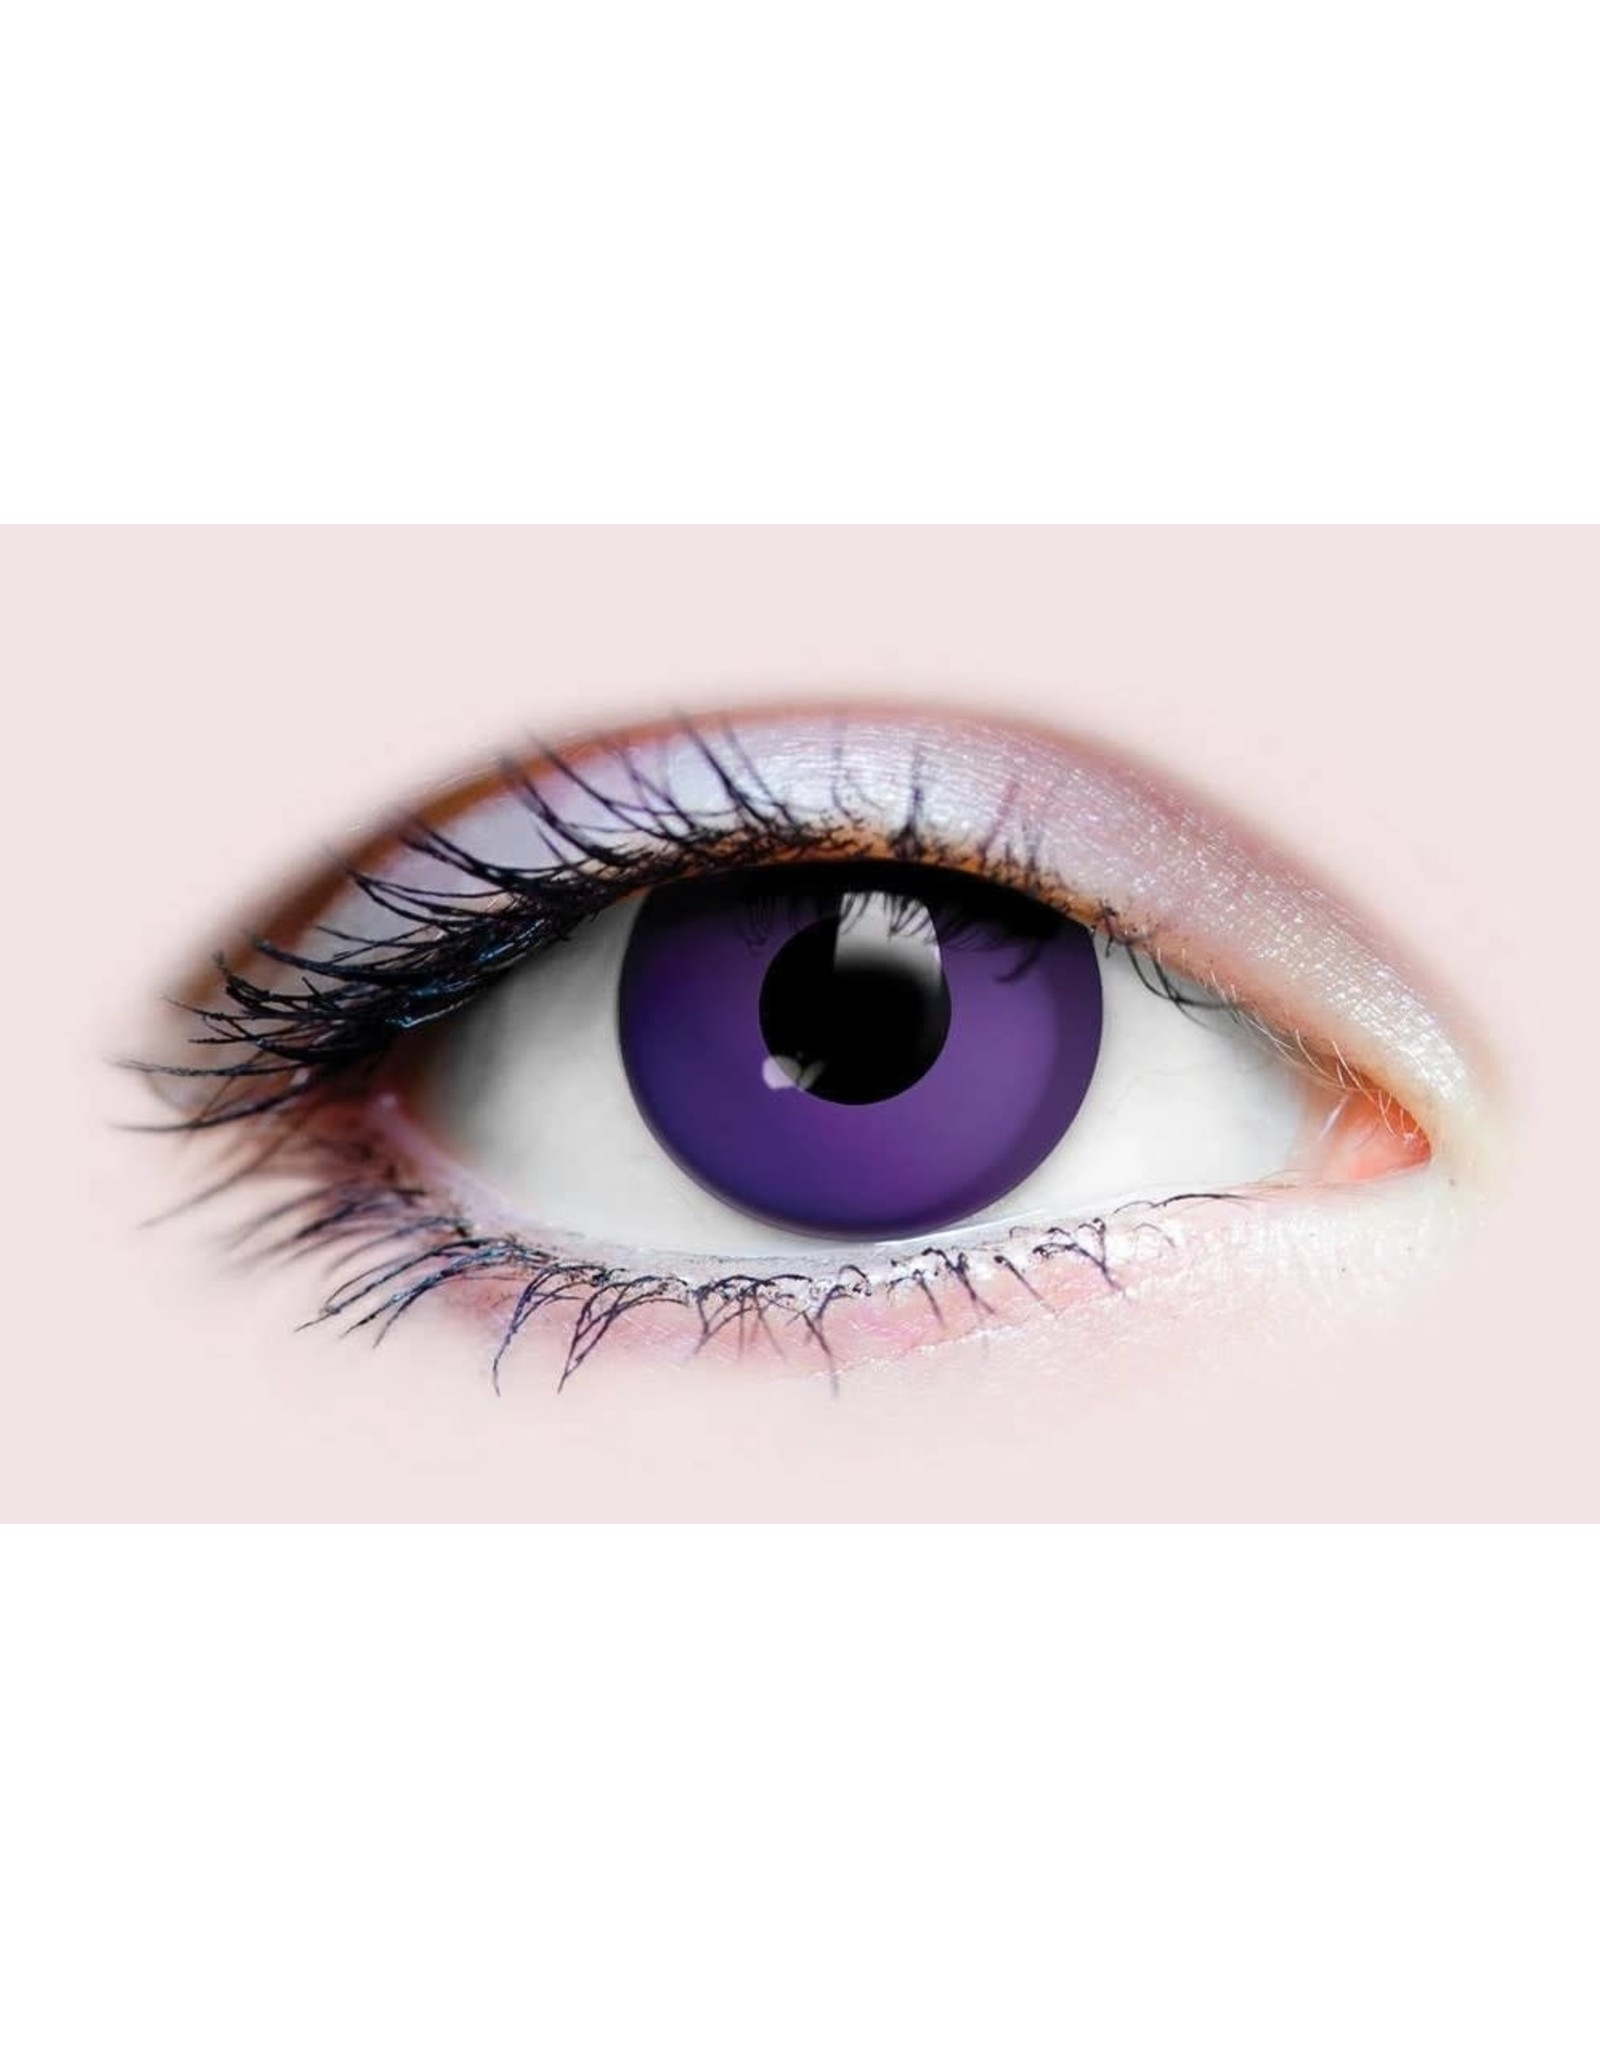 Primal Costume Contact Lenses - Phantom